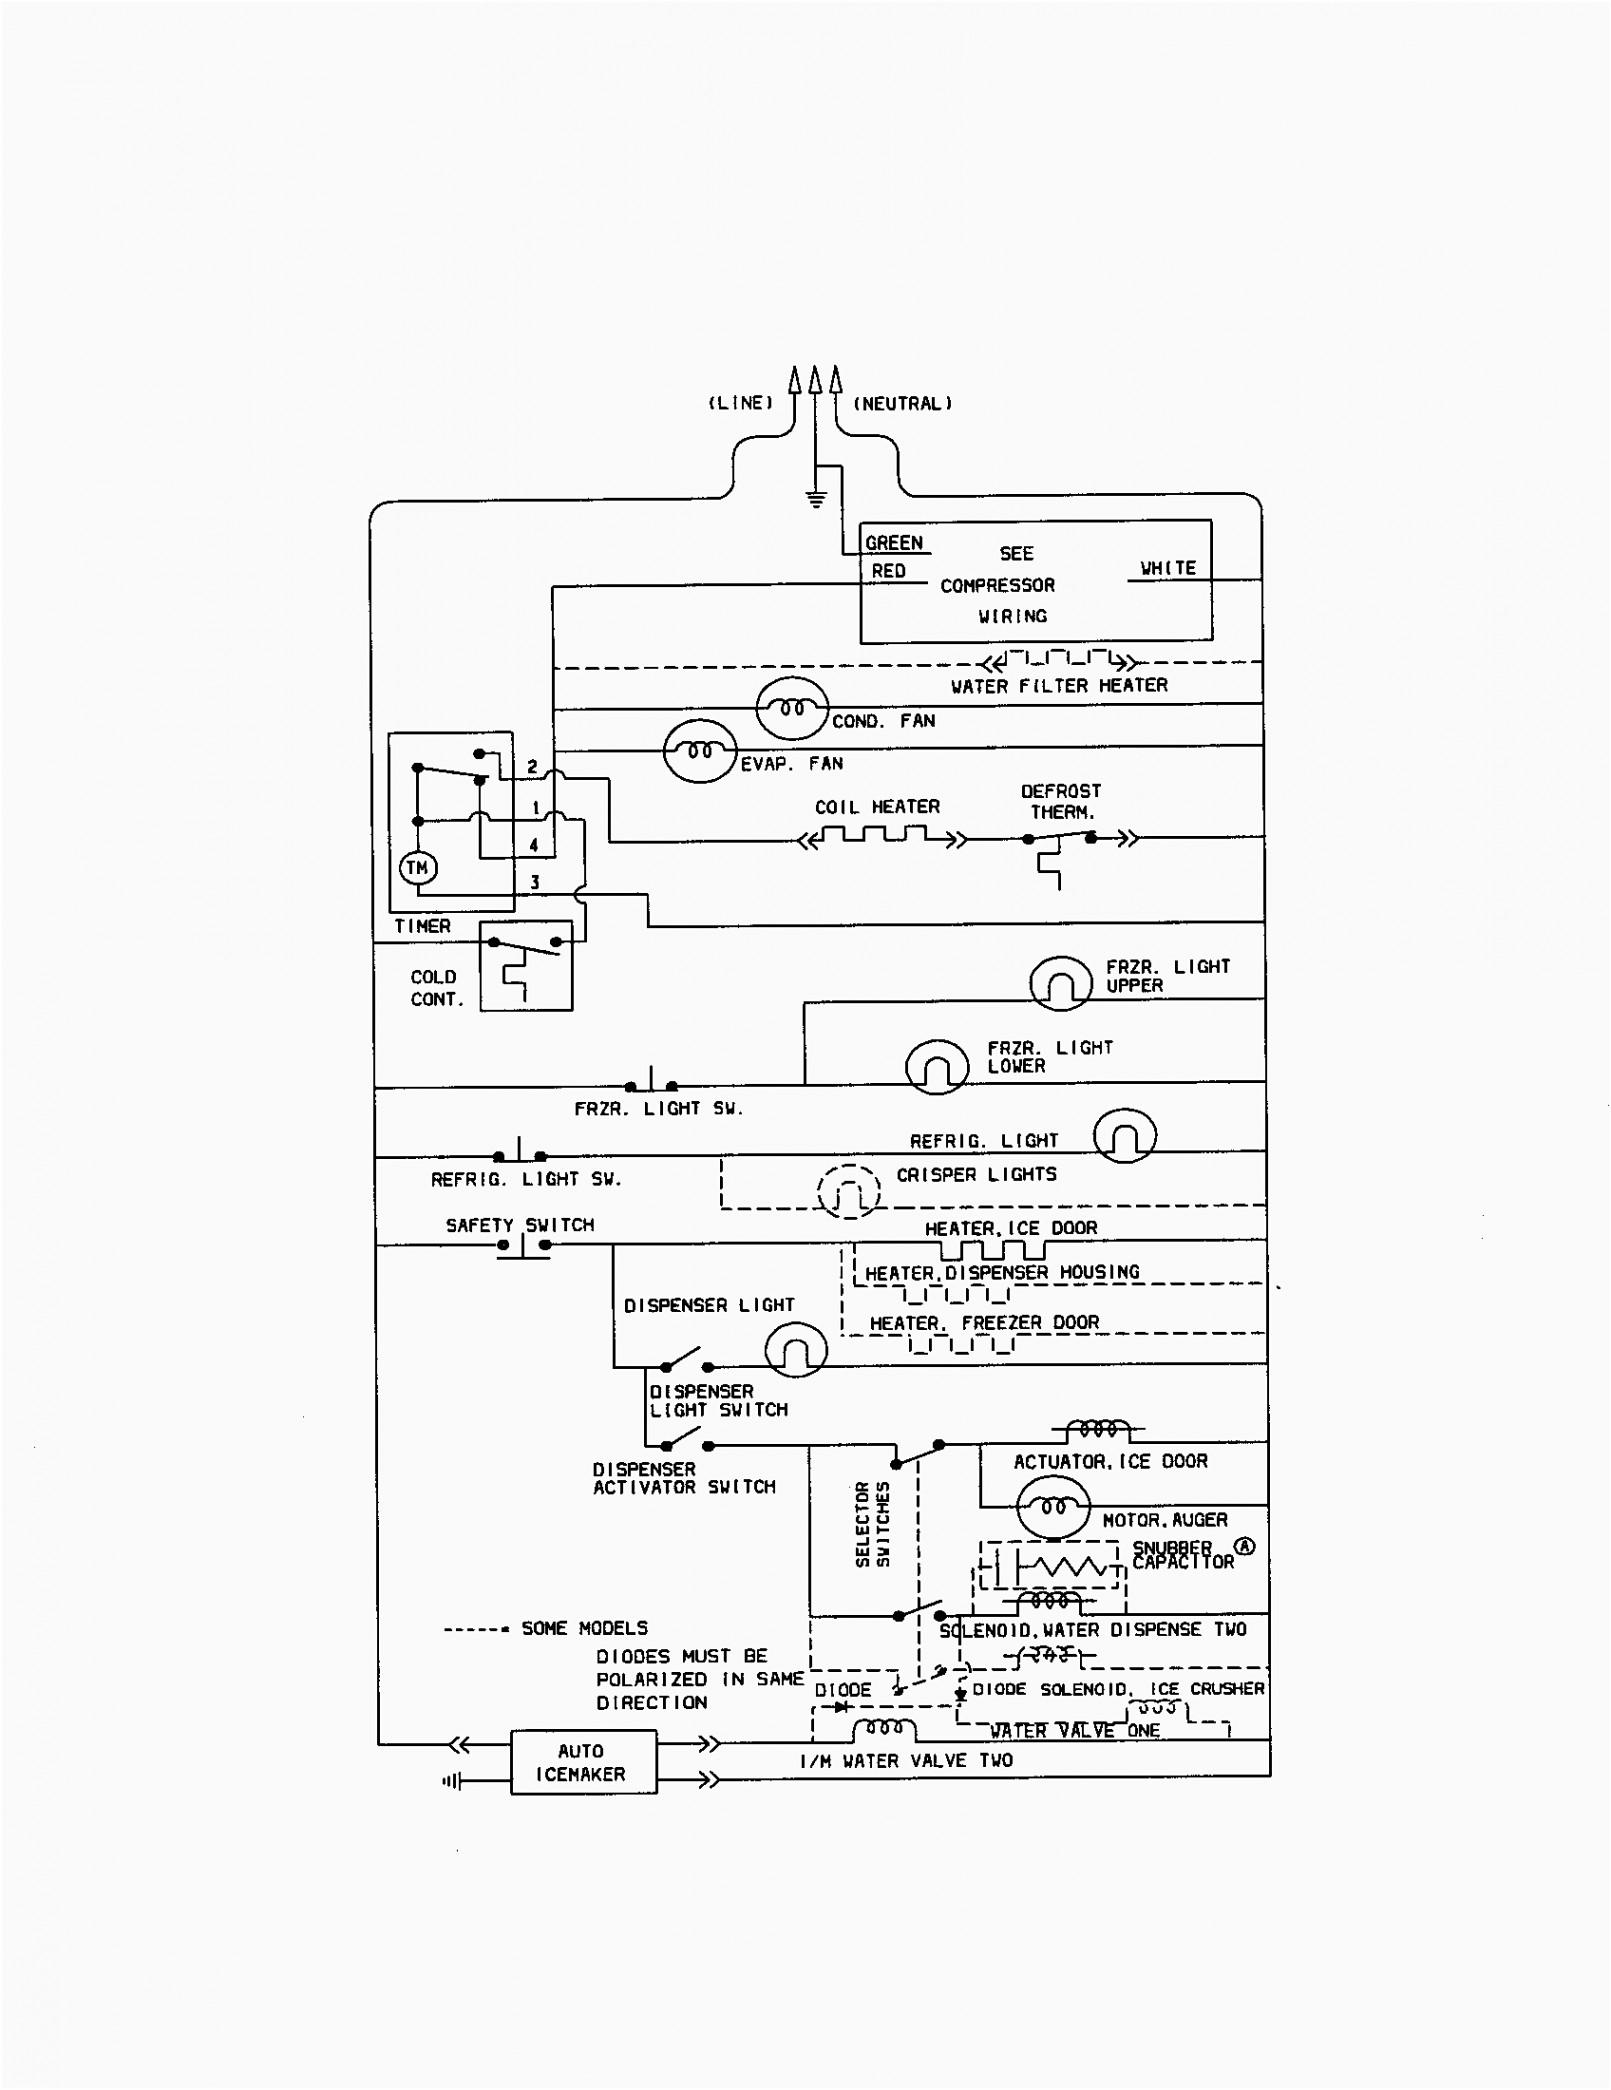 kenmore ice maker wiring schematic